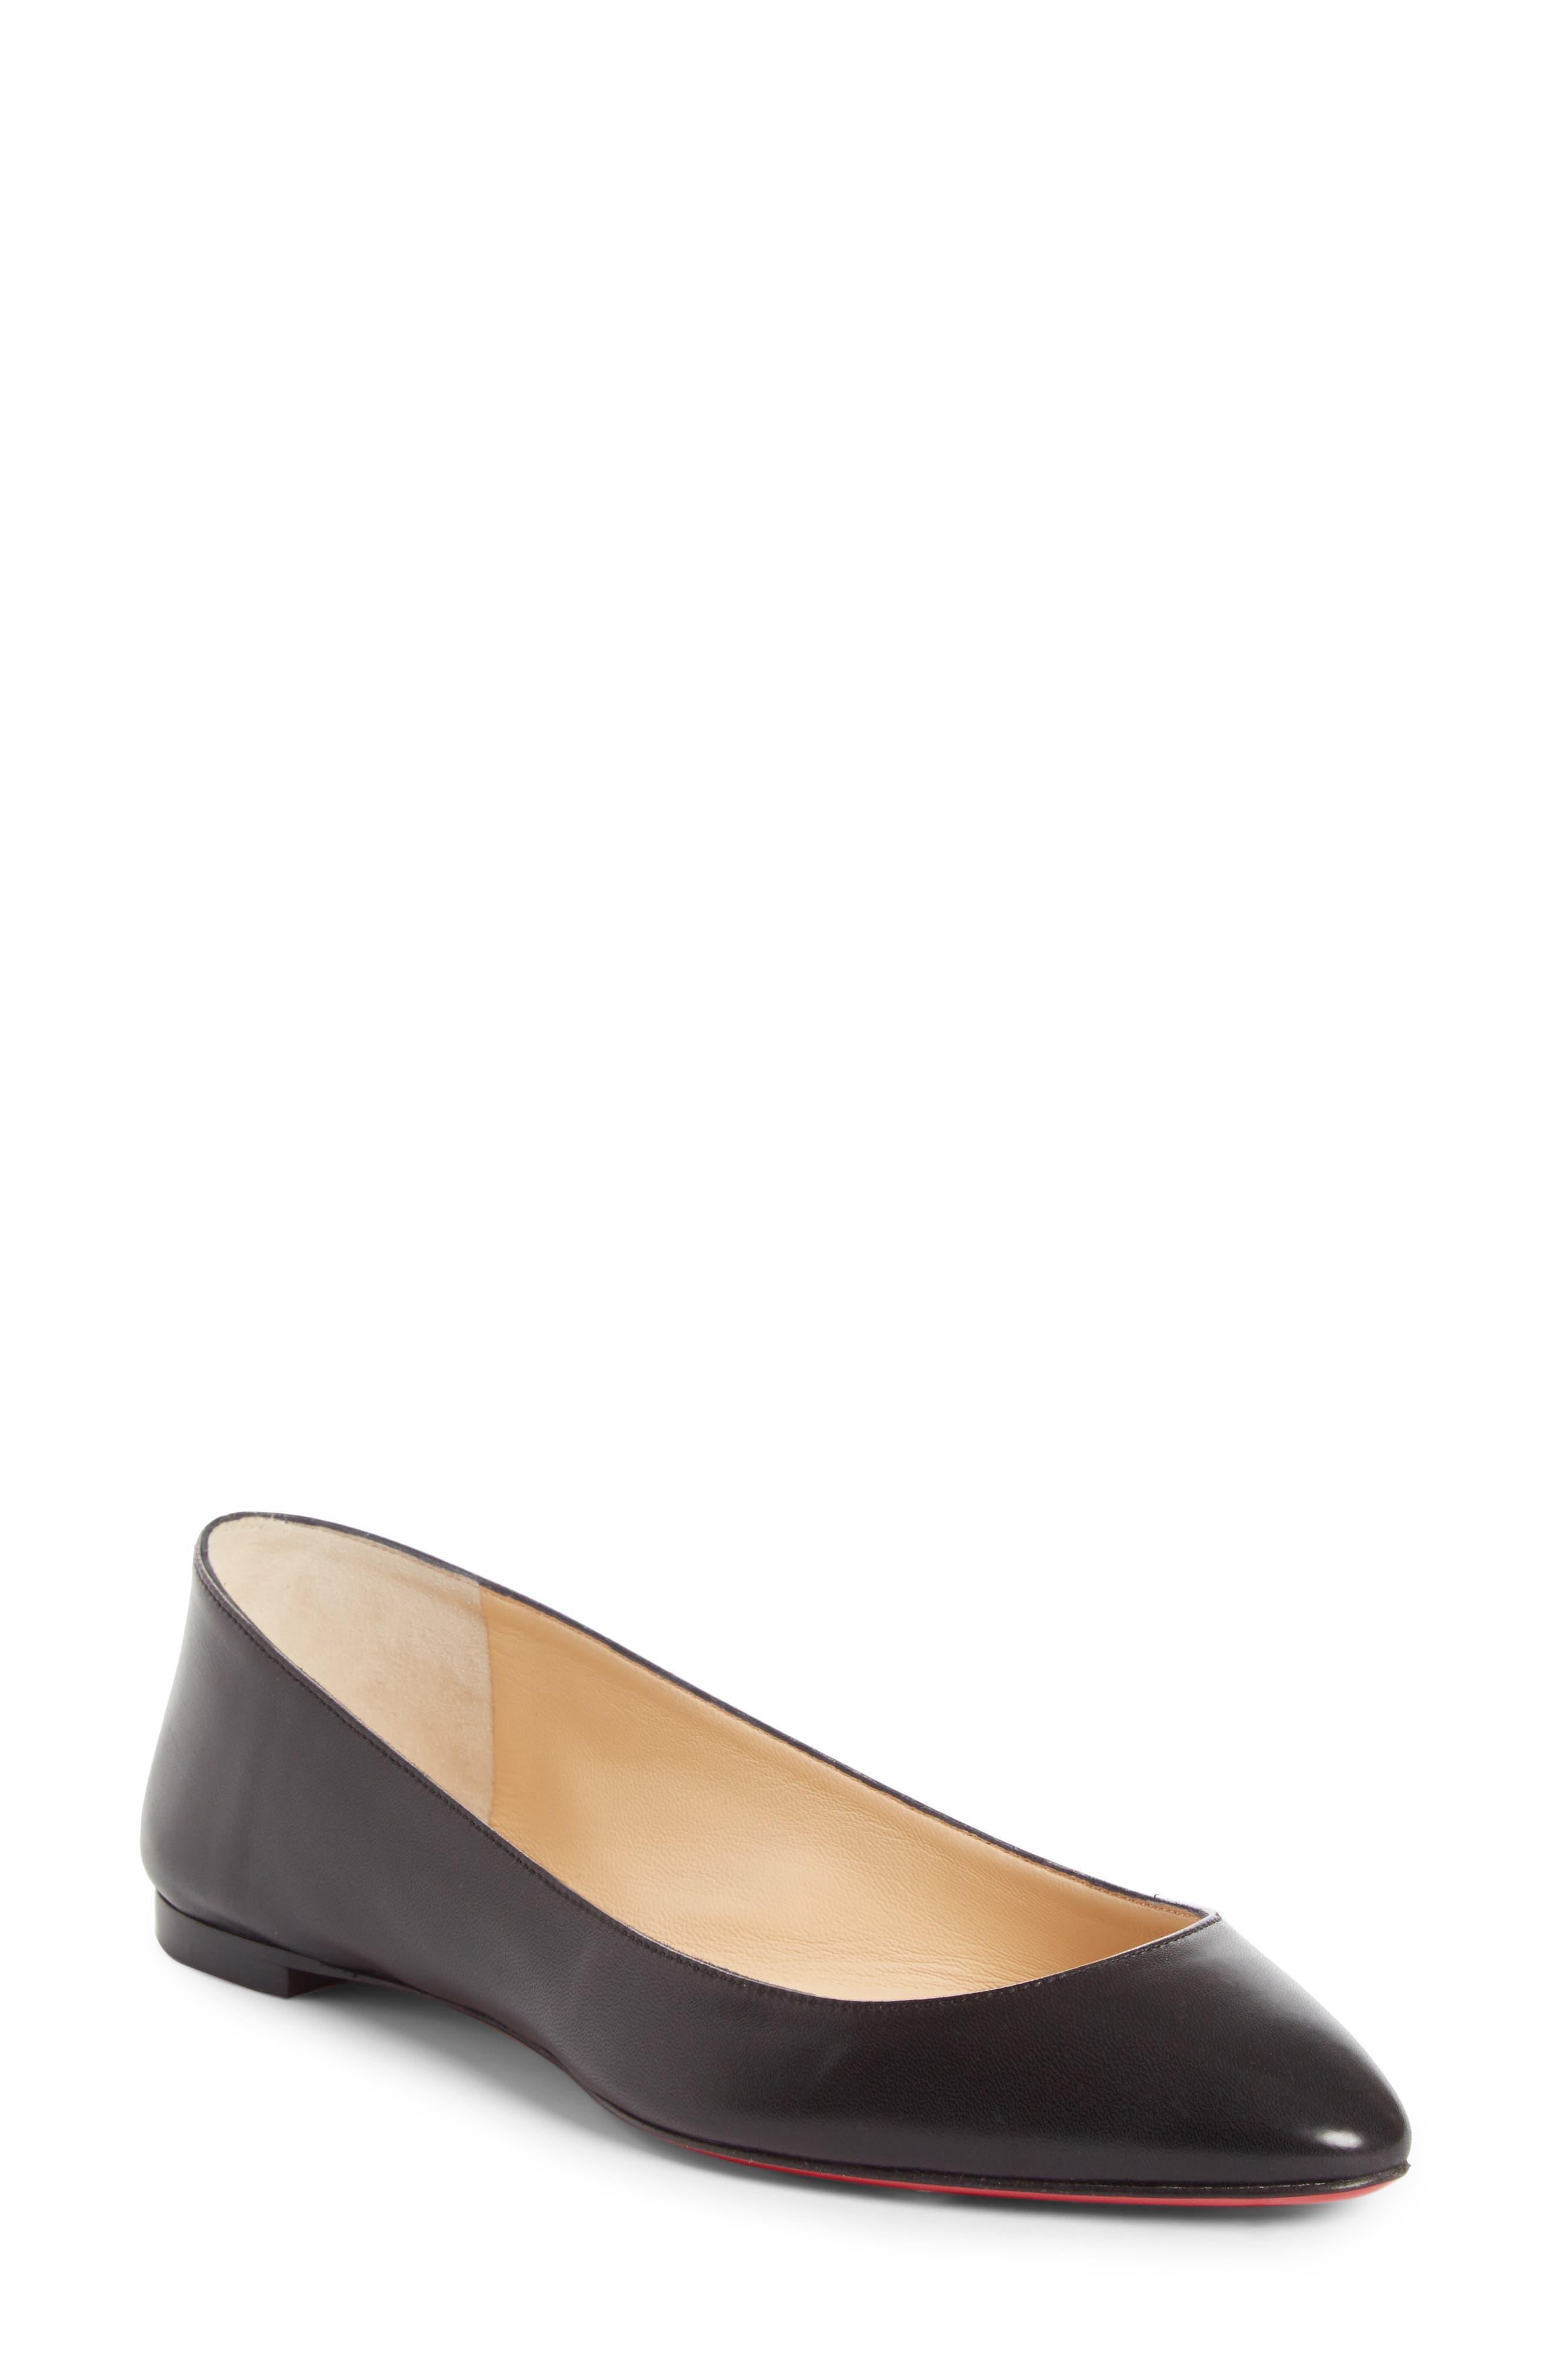 Eloise Flat,                         Main,                         color, Black Leather